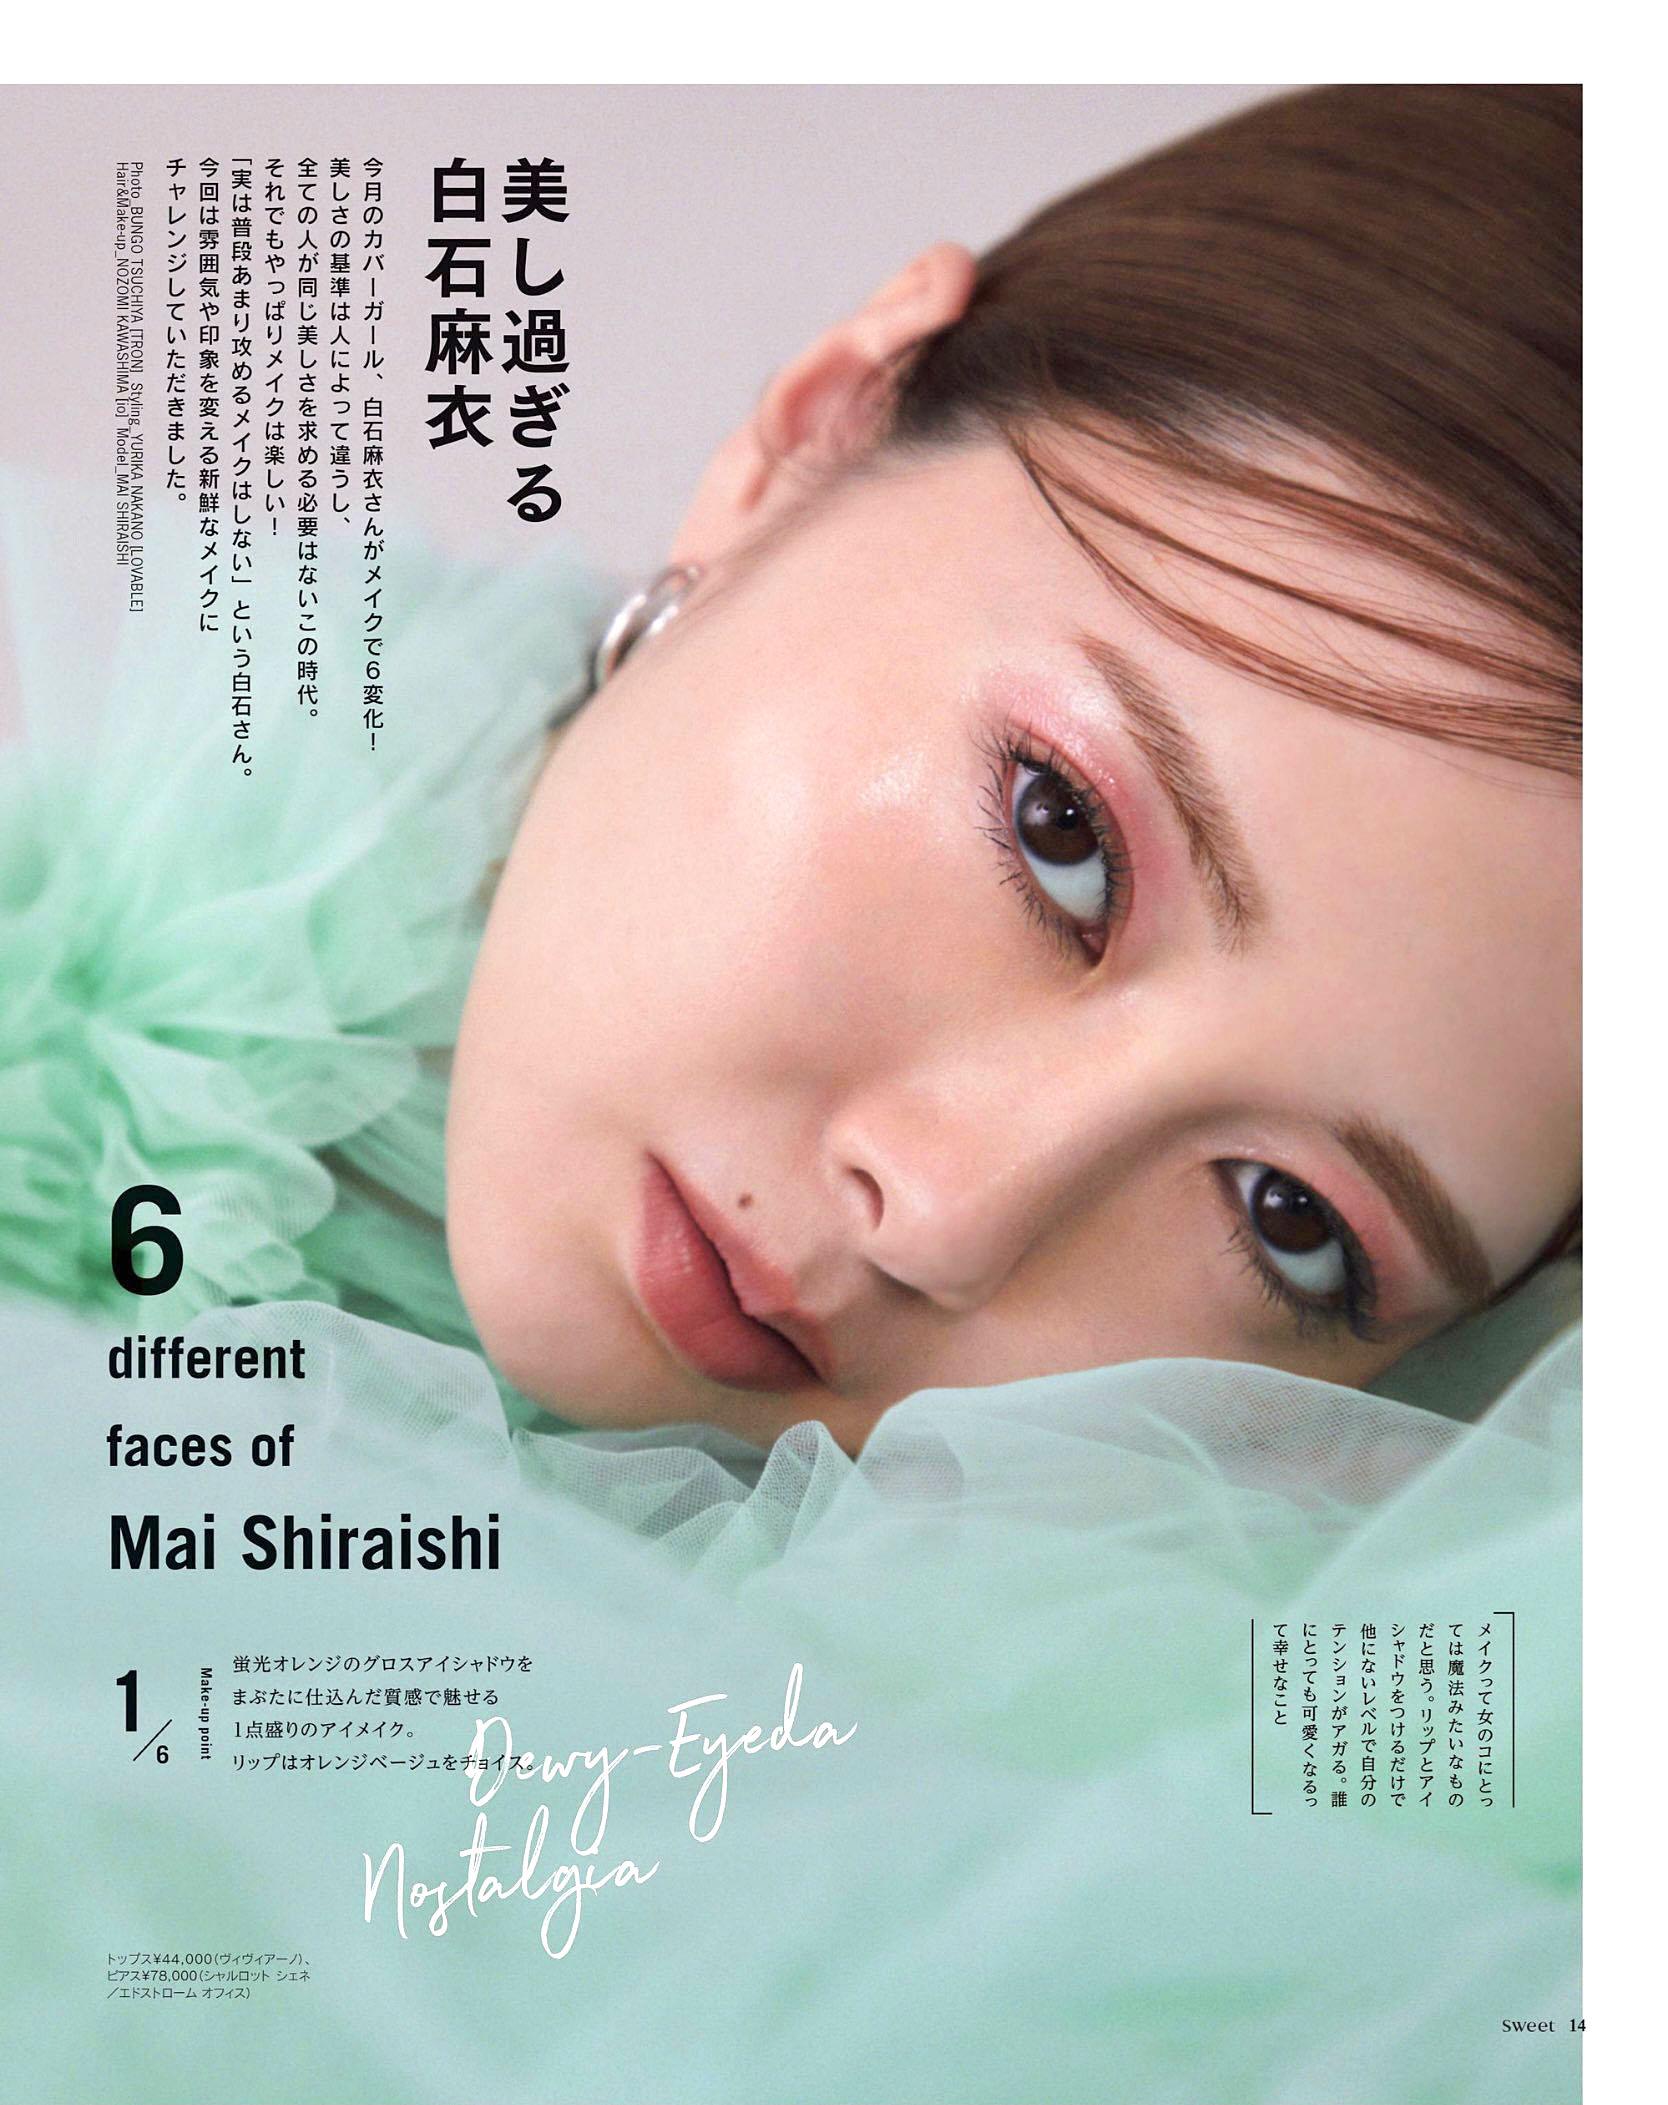 MShiraishi Sweet 2108 02.jpg